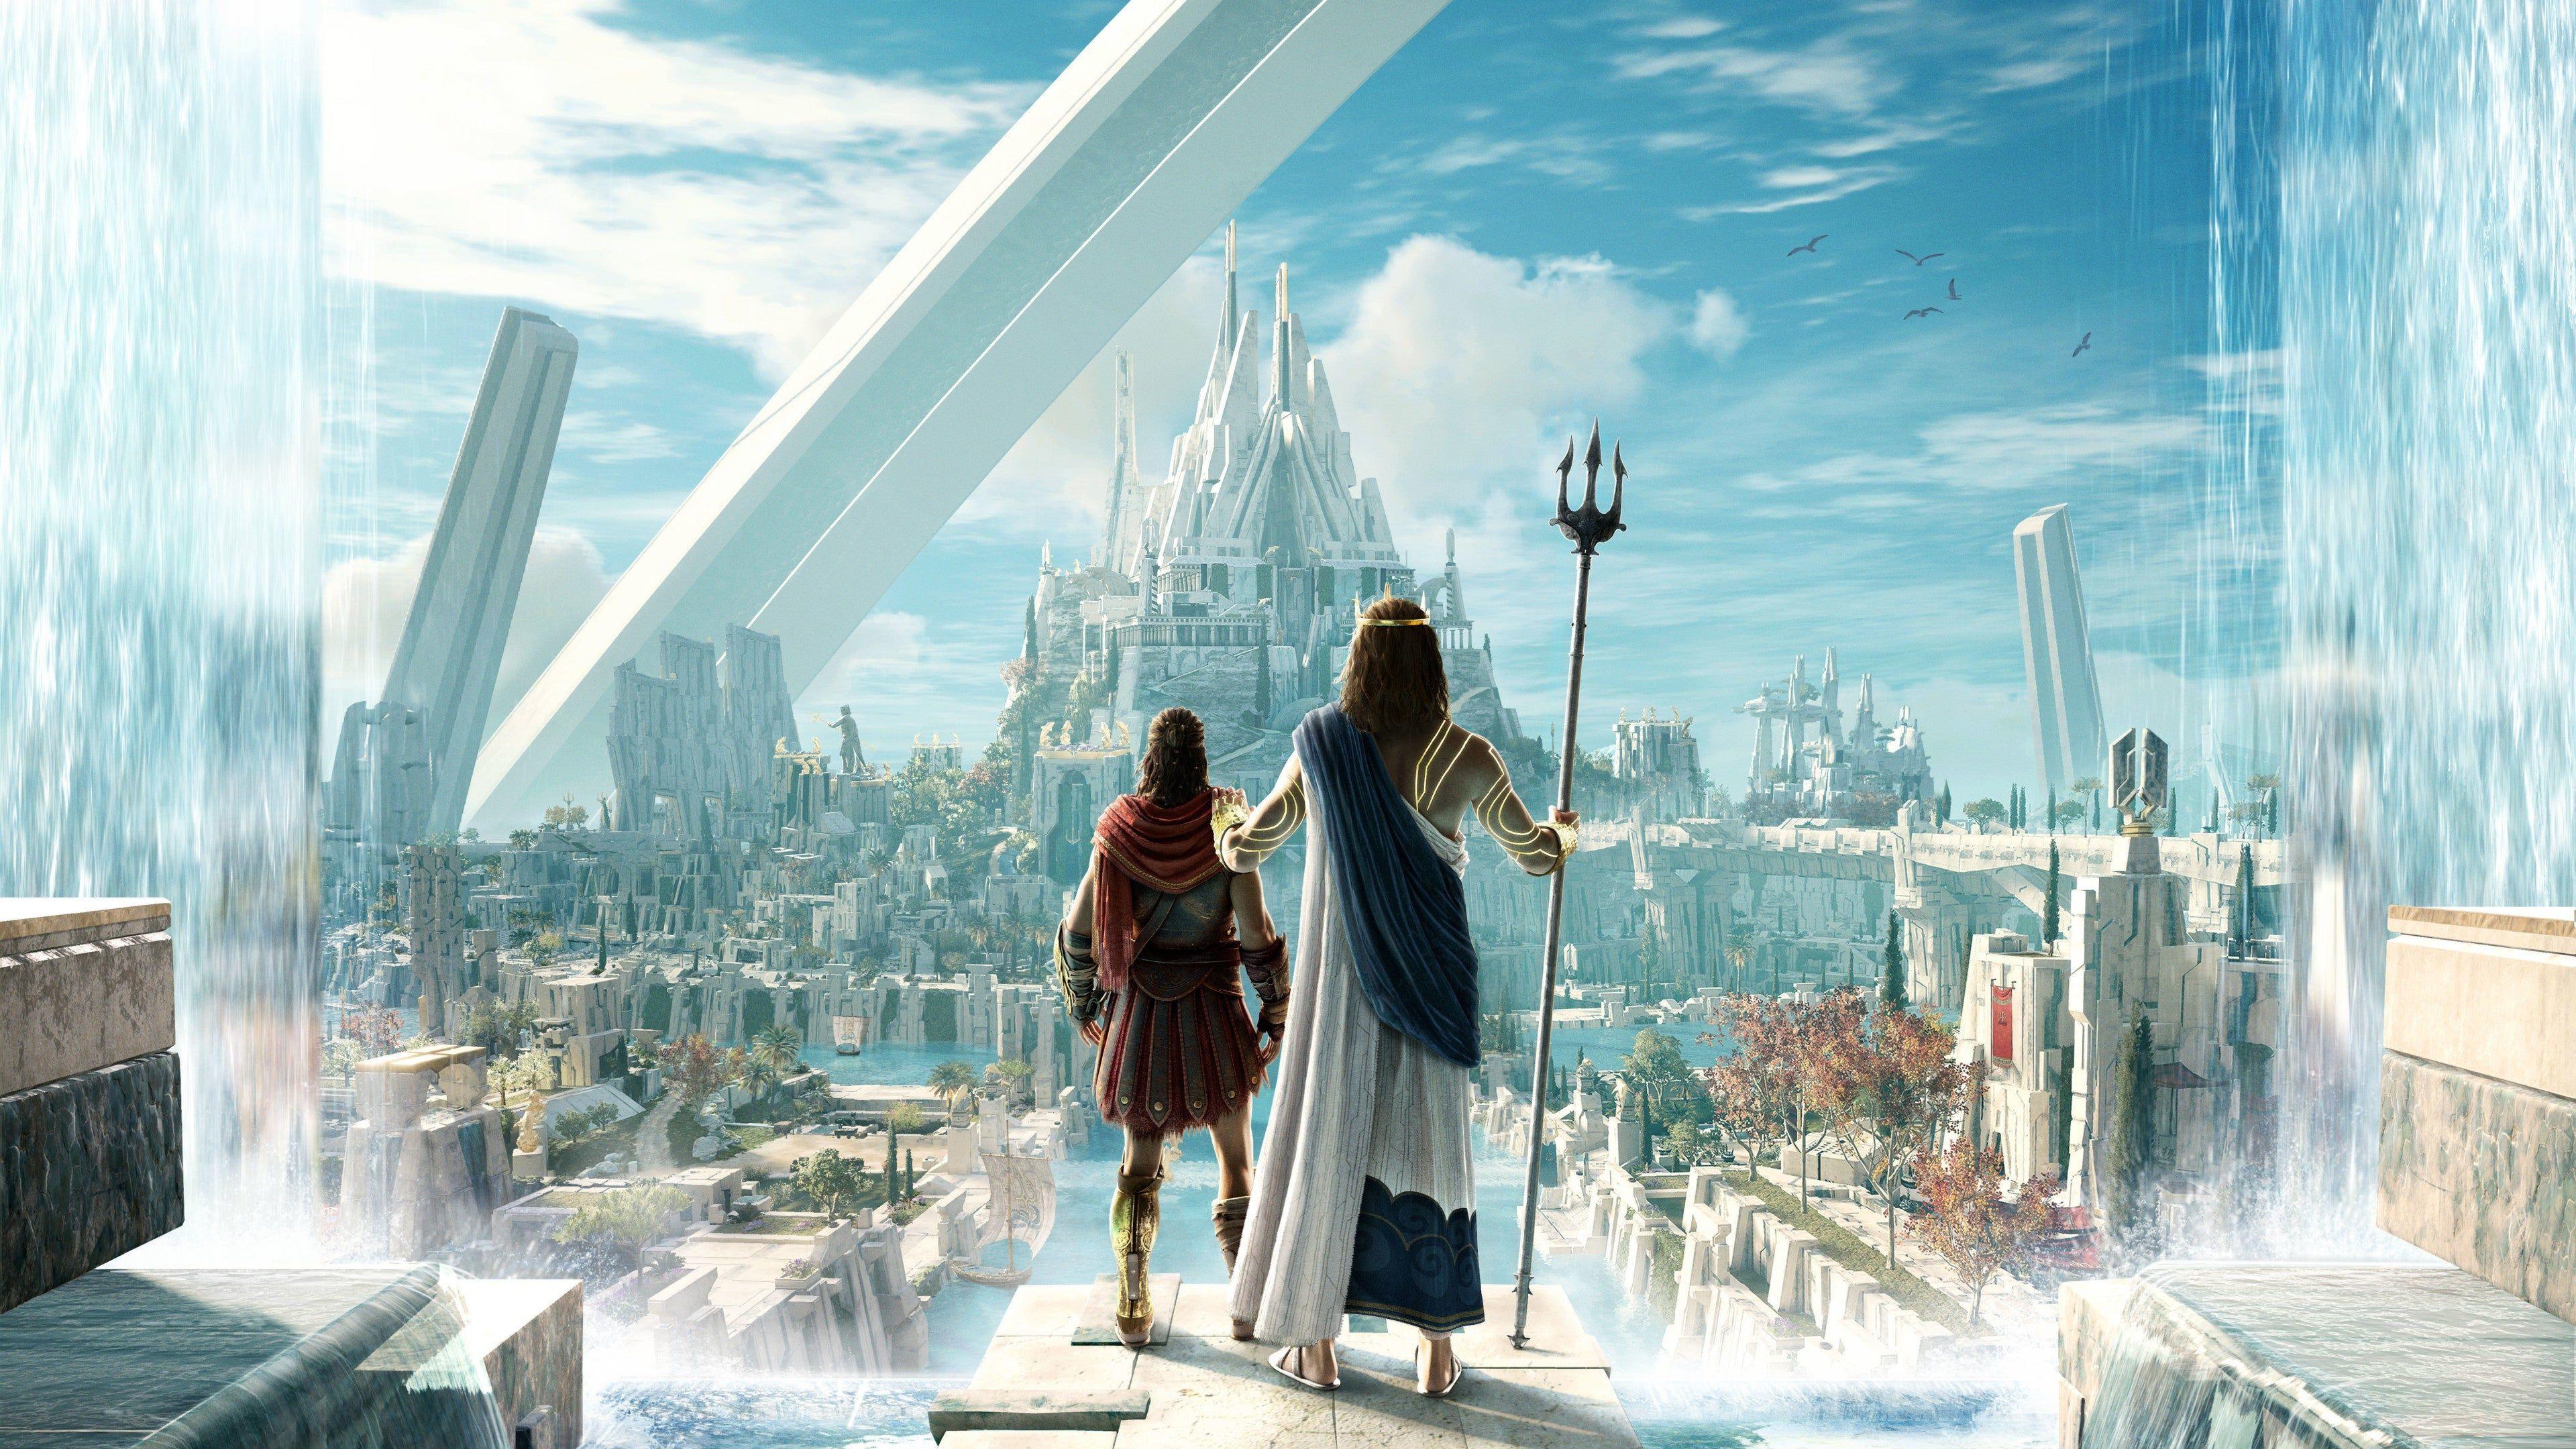 Assassins Creed Odyssey 4k Wallpaper Assassin S Creed Wallpaper Assassins Creed Odyssey Wallpaper Assassins Creed